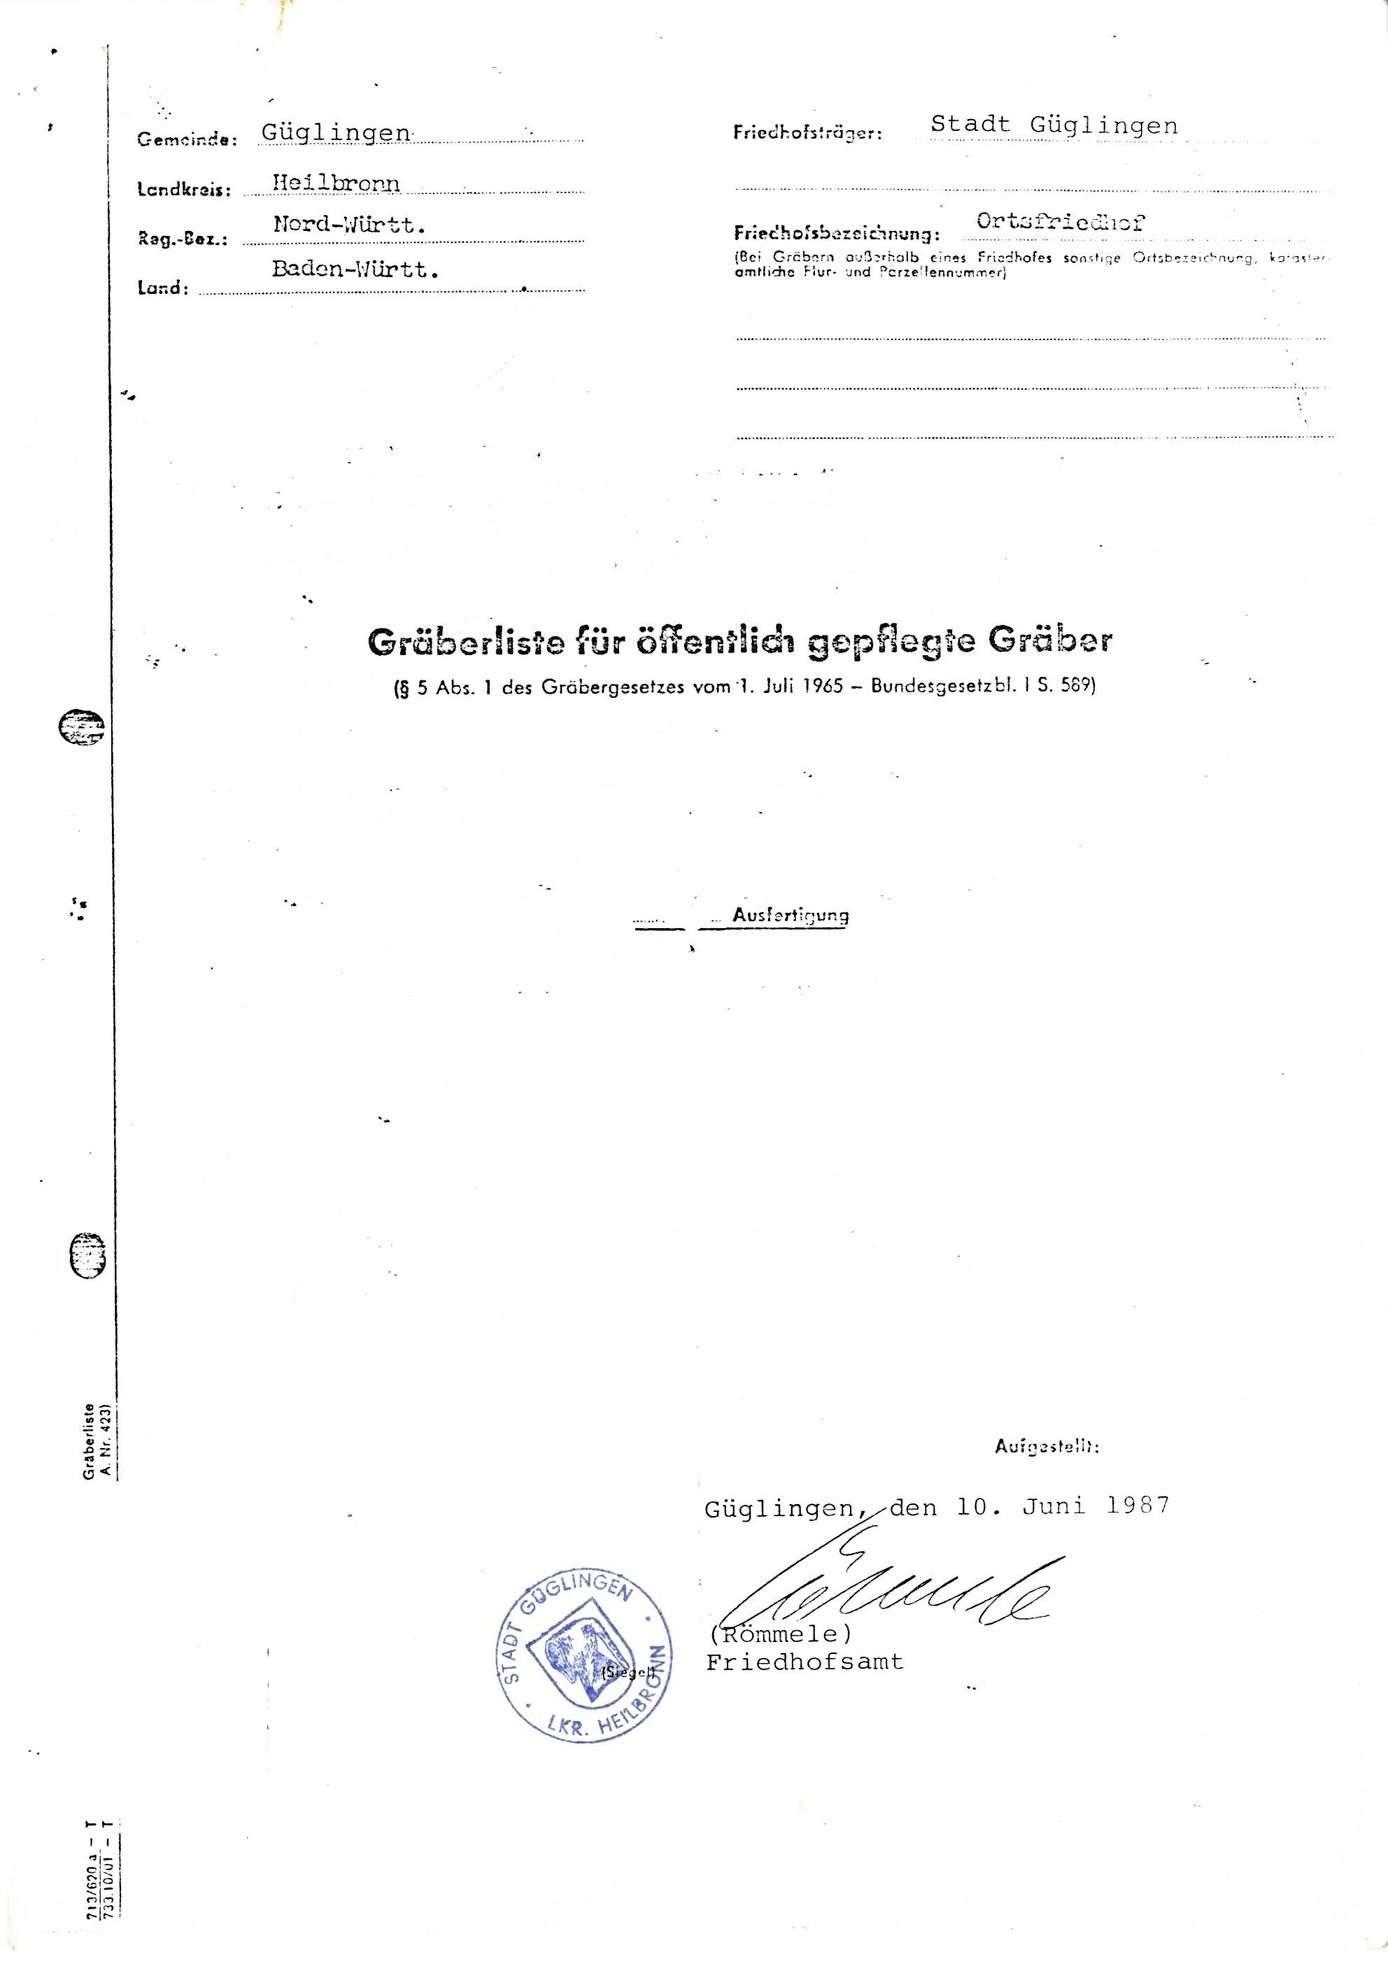 Eibensbach, Bild 3